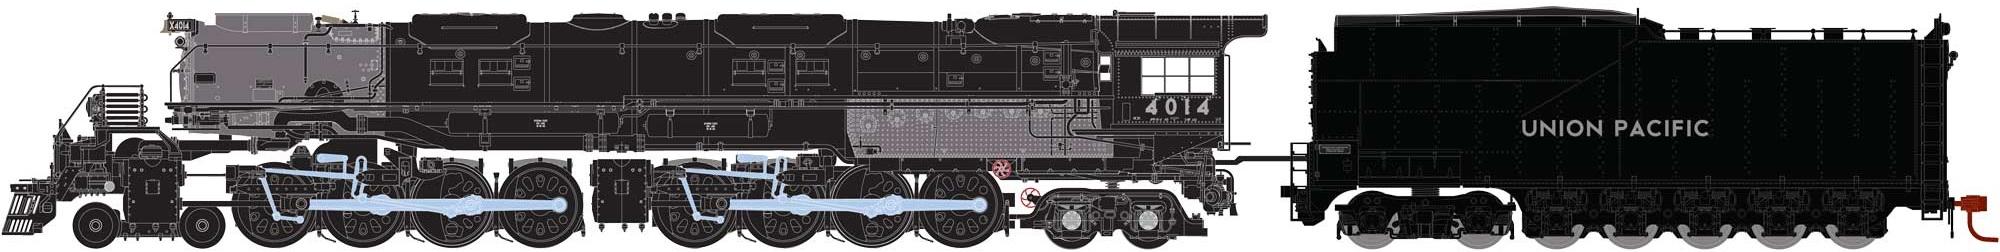 N Scale - Athearn - 22902 - Locomotive, Steam, 4-8-8-4 Big Boy - Union Pacific - 4014